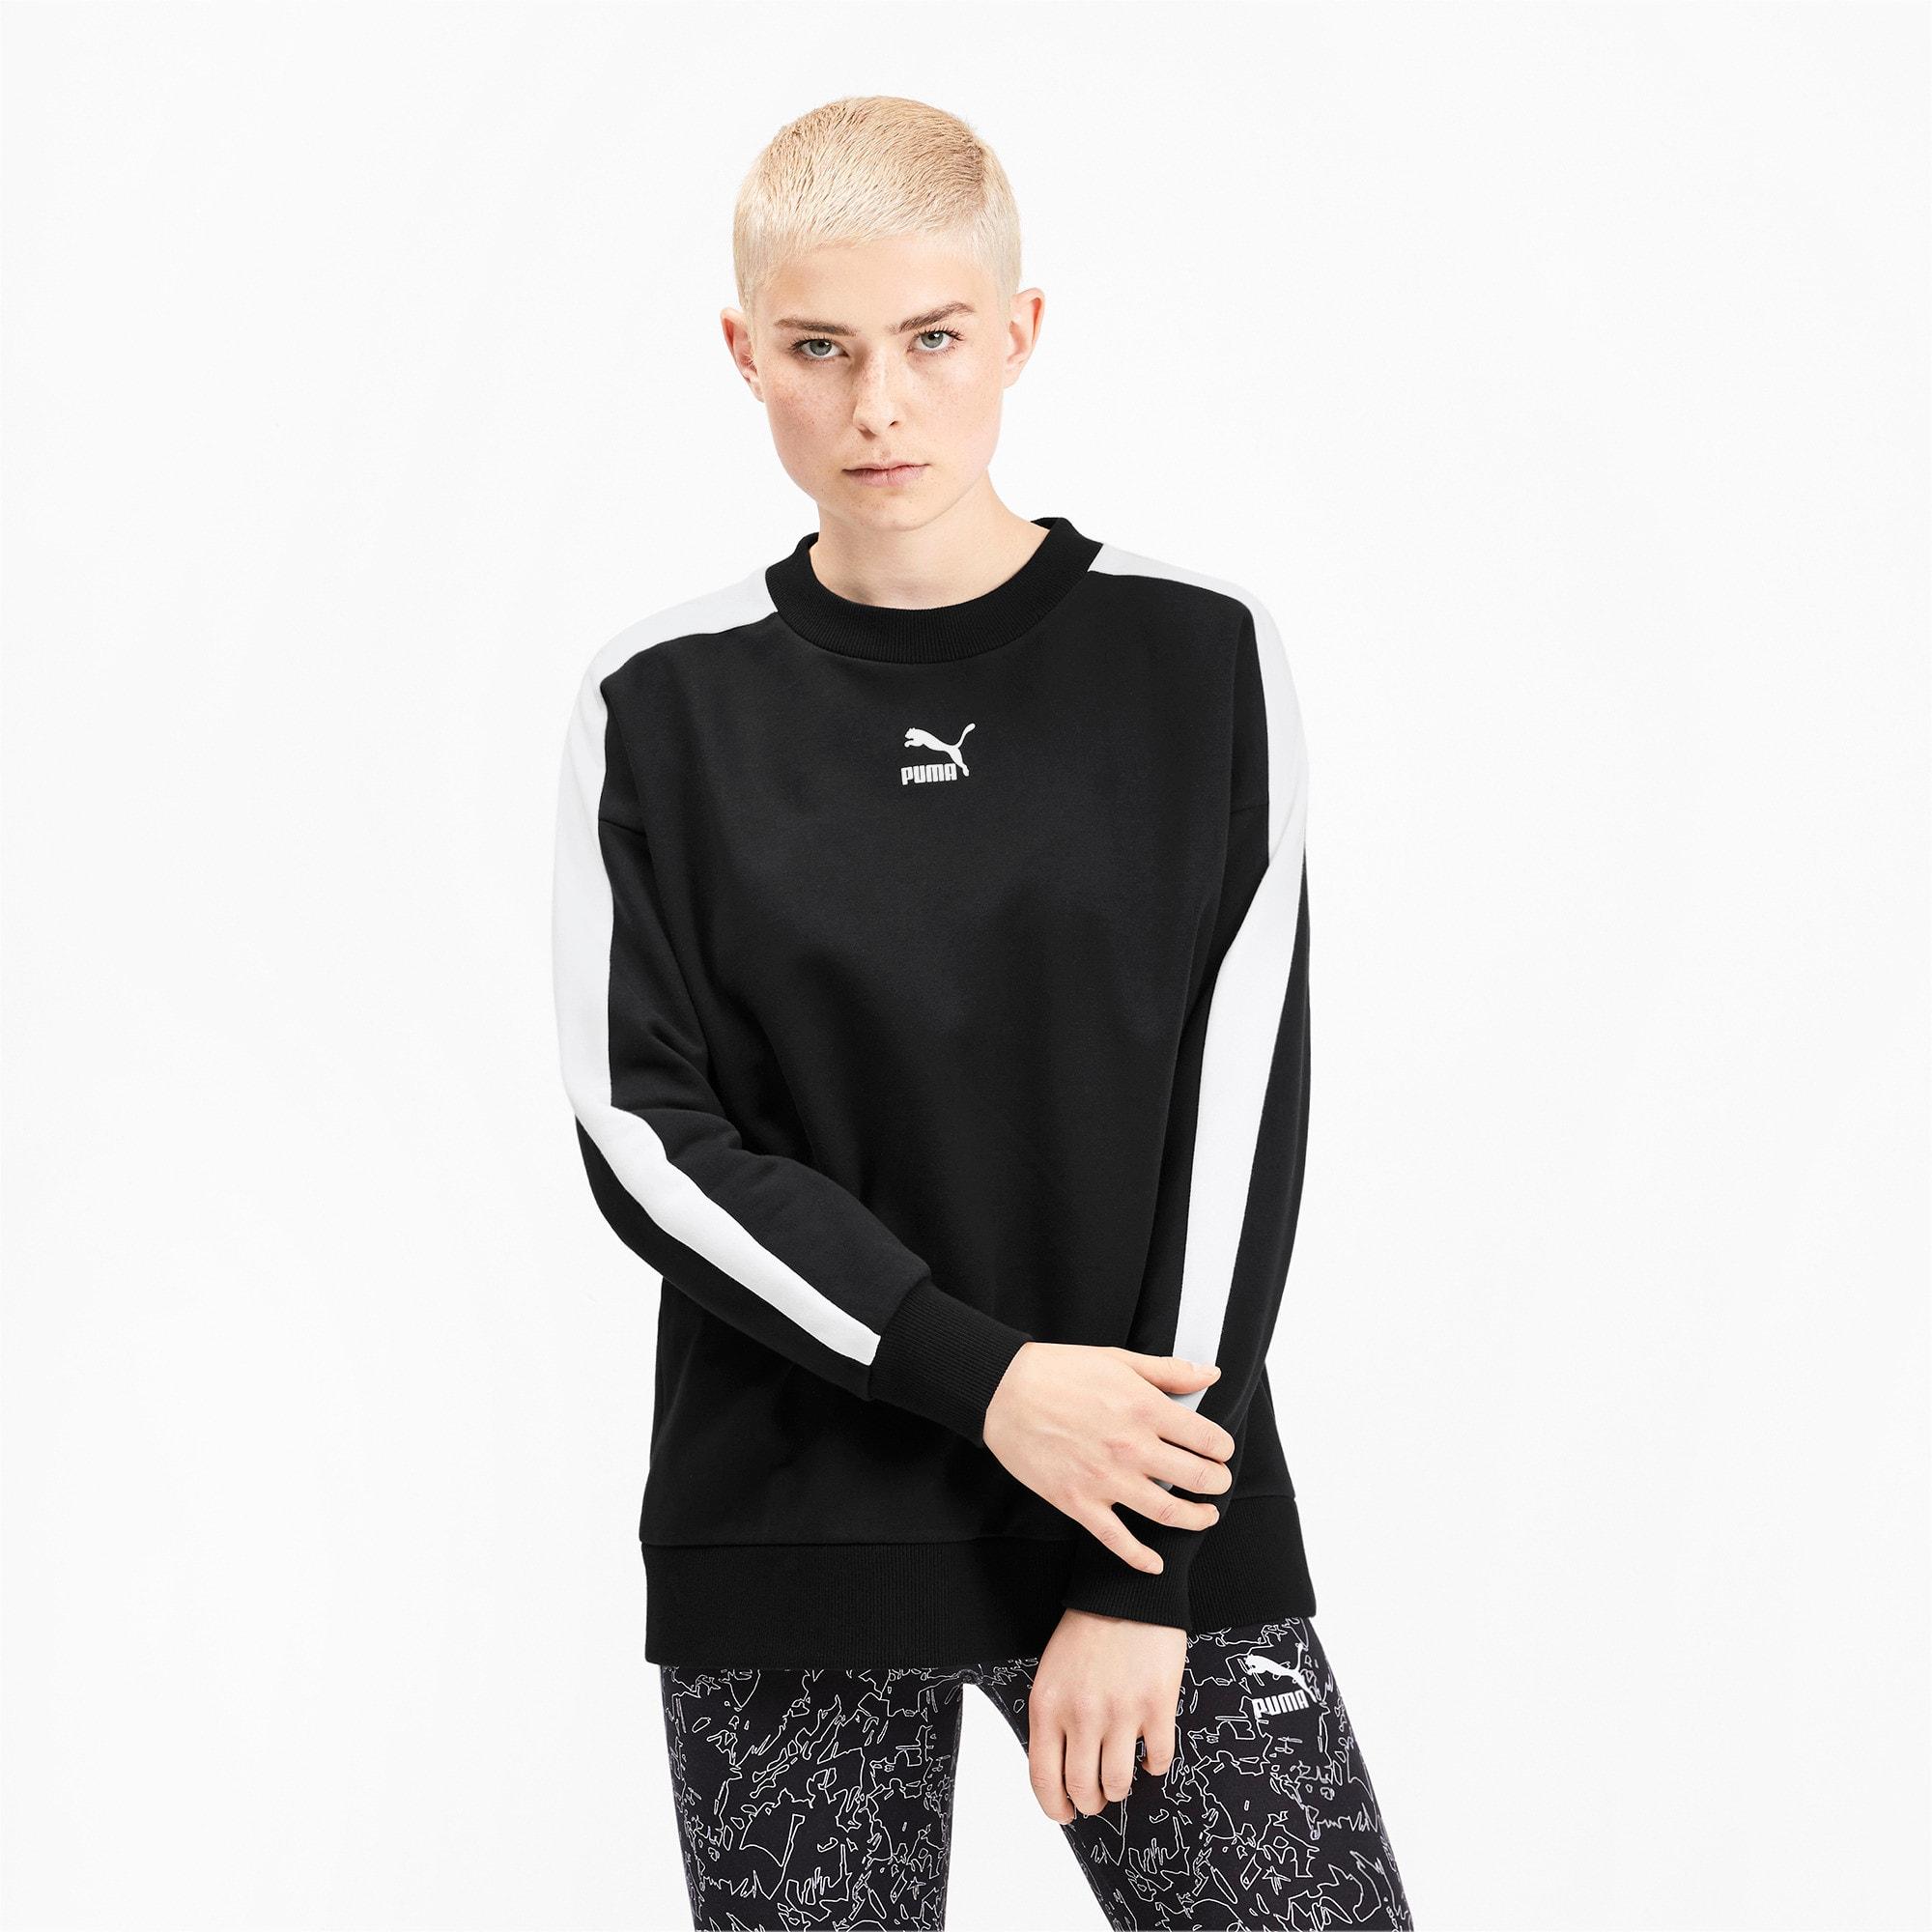 Thumbnail 2 of Classics T7 Women's Crewneck Sweatshirt, Puma Black, medium